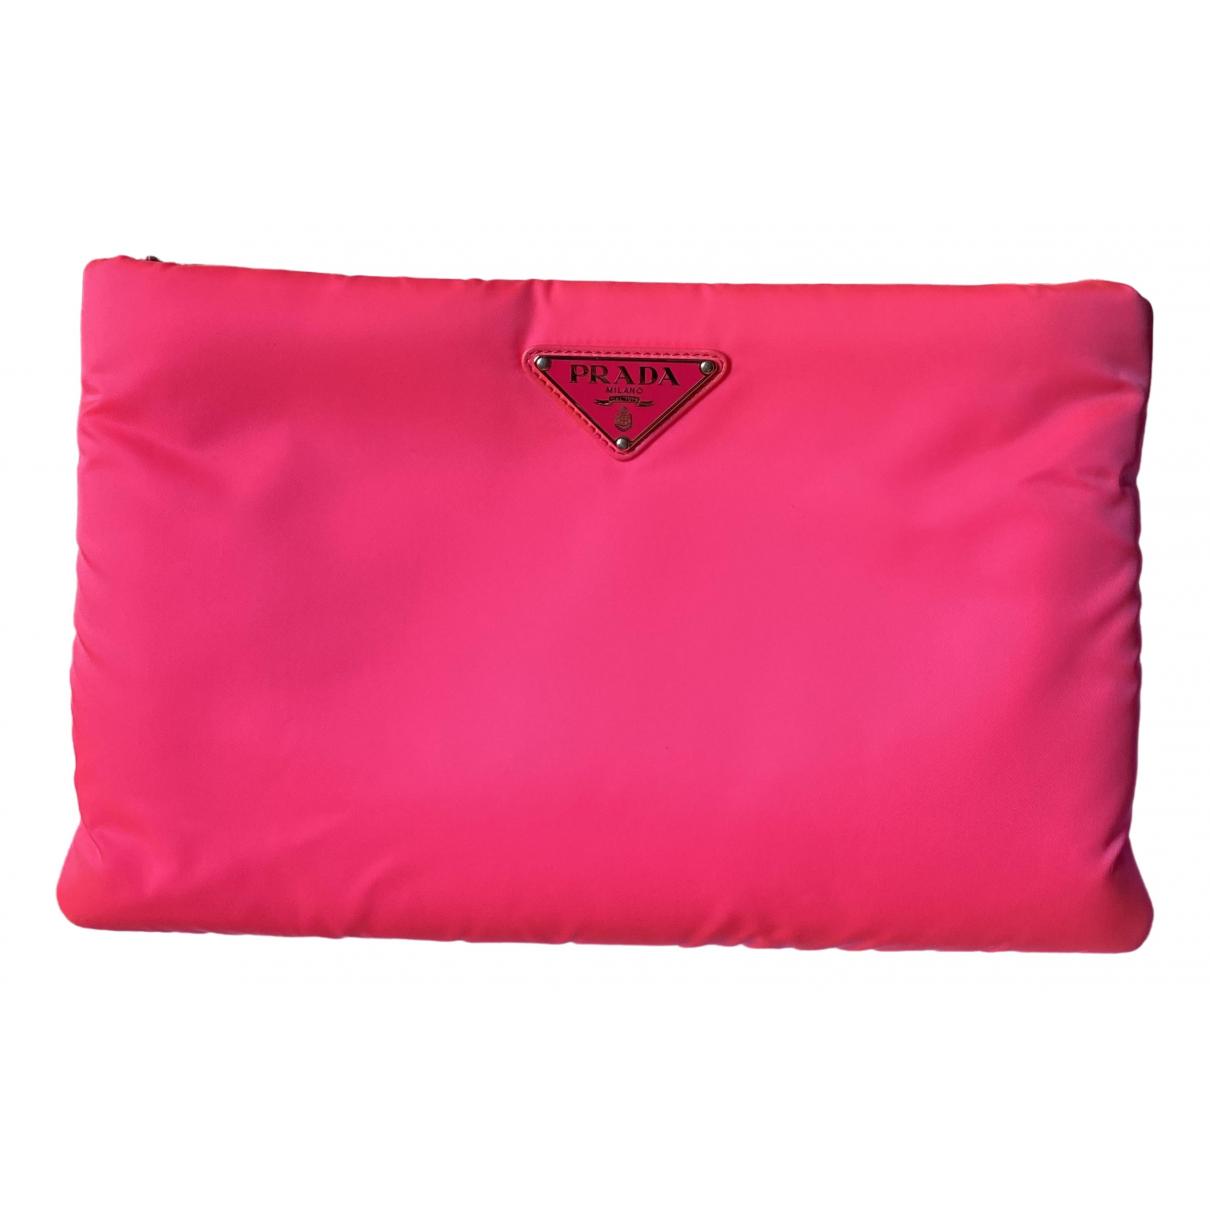 Prada \N Pink Clutch bag for Women \N